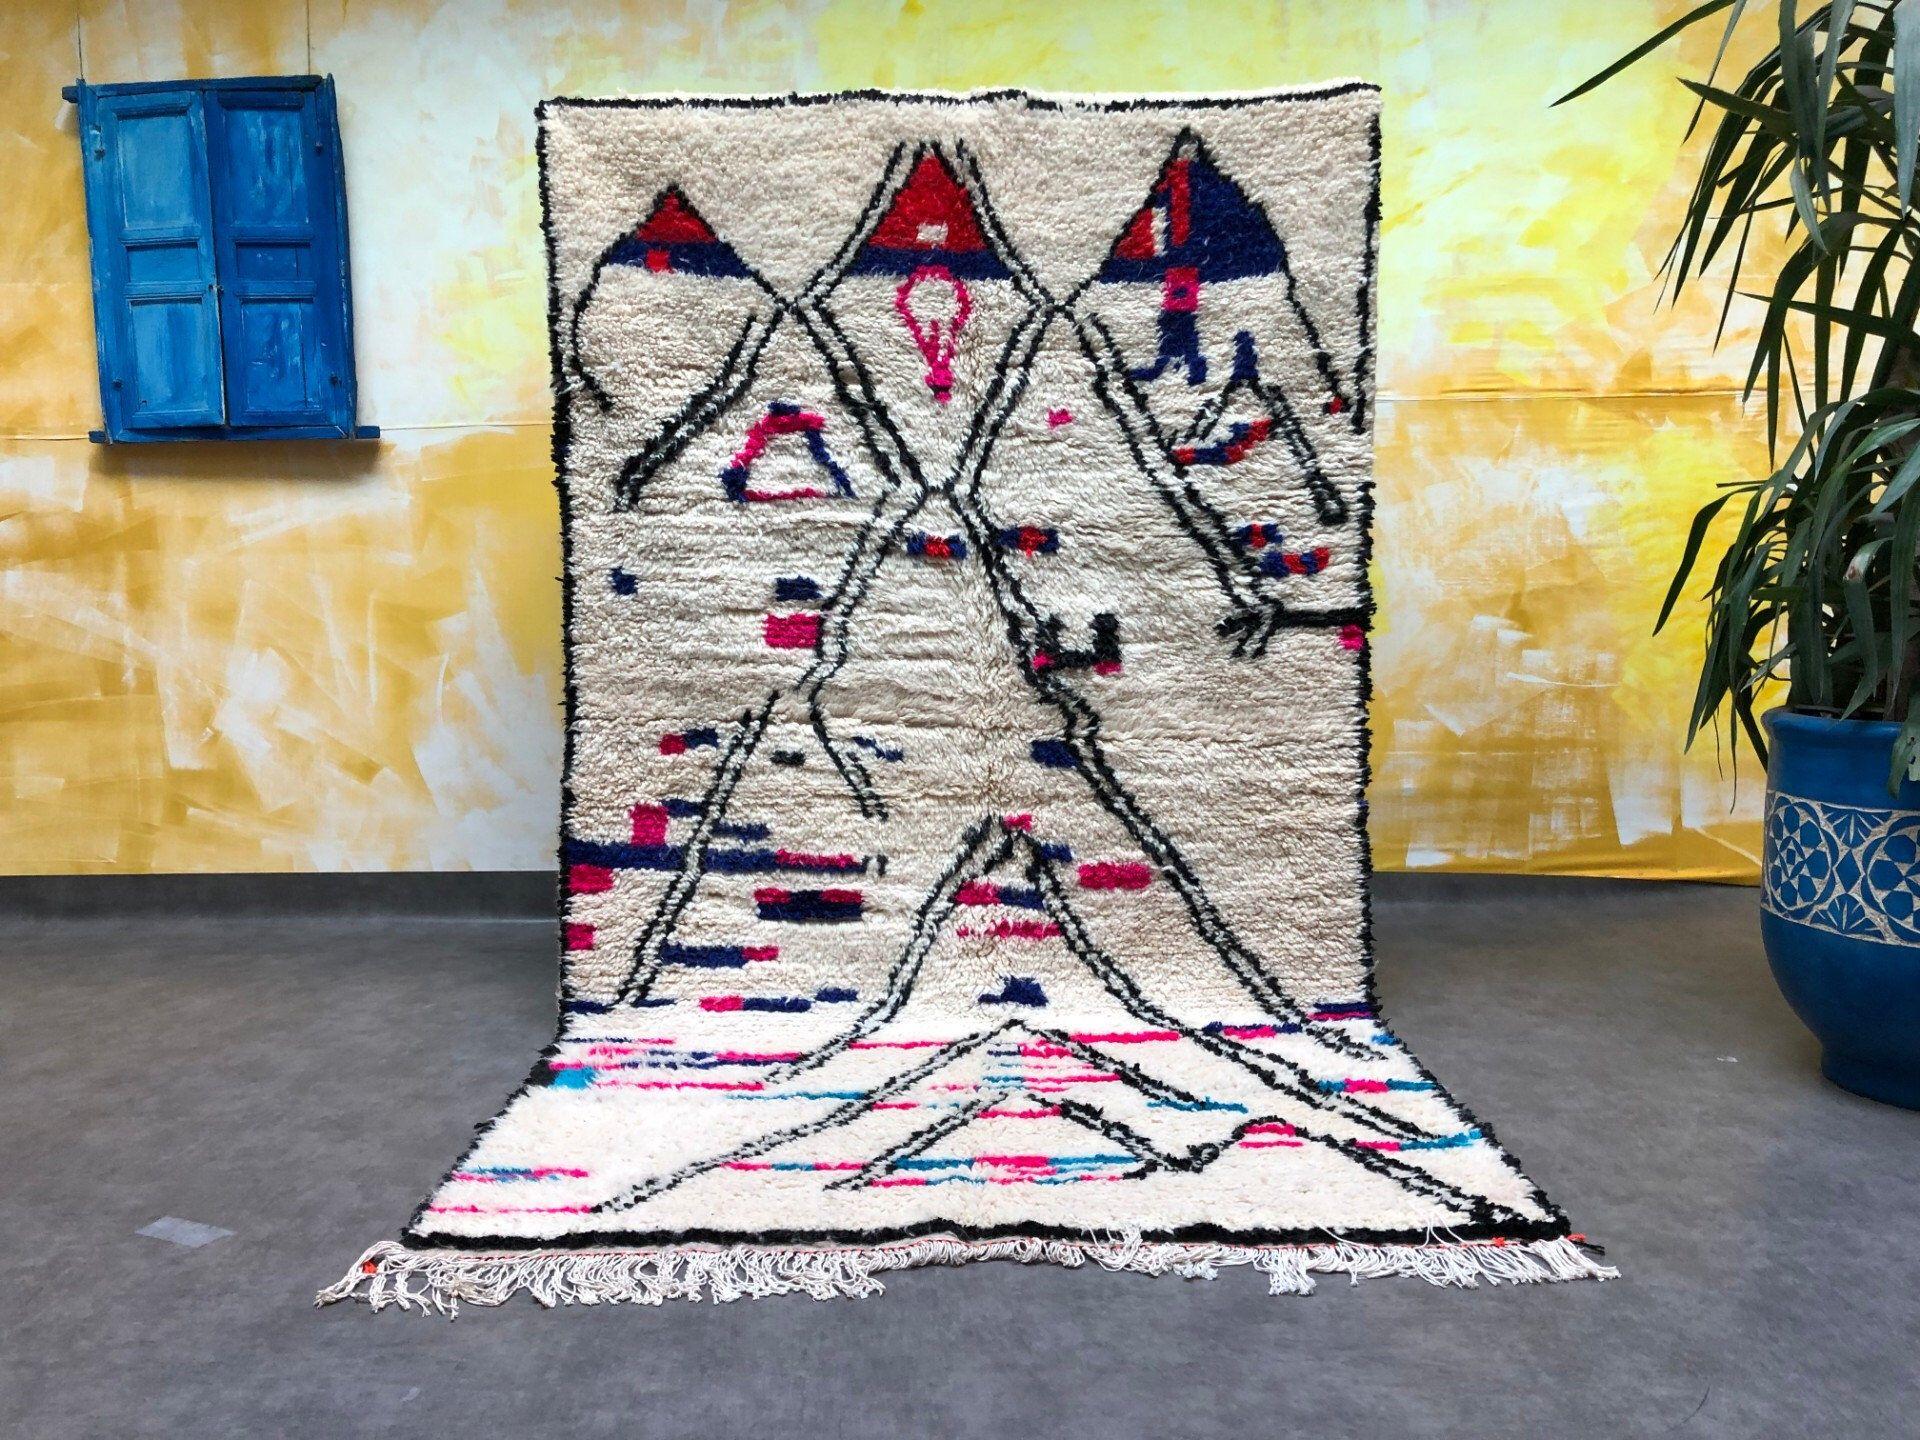 Amazing Azilal Moroccan Rug 4x8 100 Wool Berber Carpet Etsy Berber Carpet Moroccan Rug Azilal